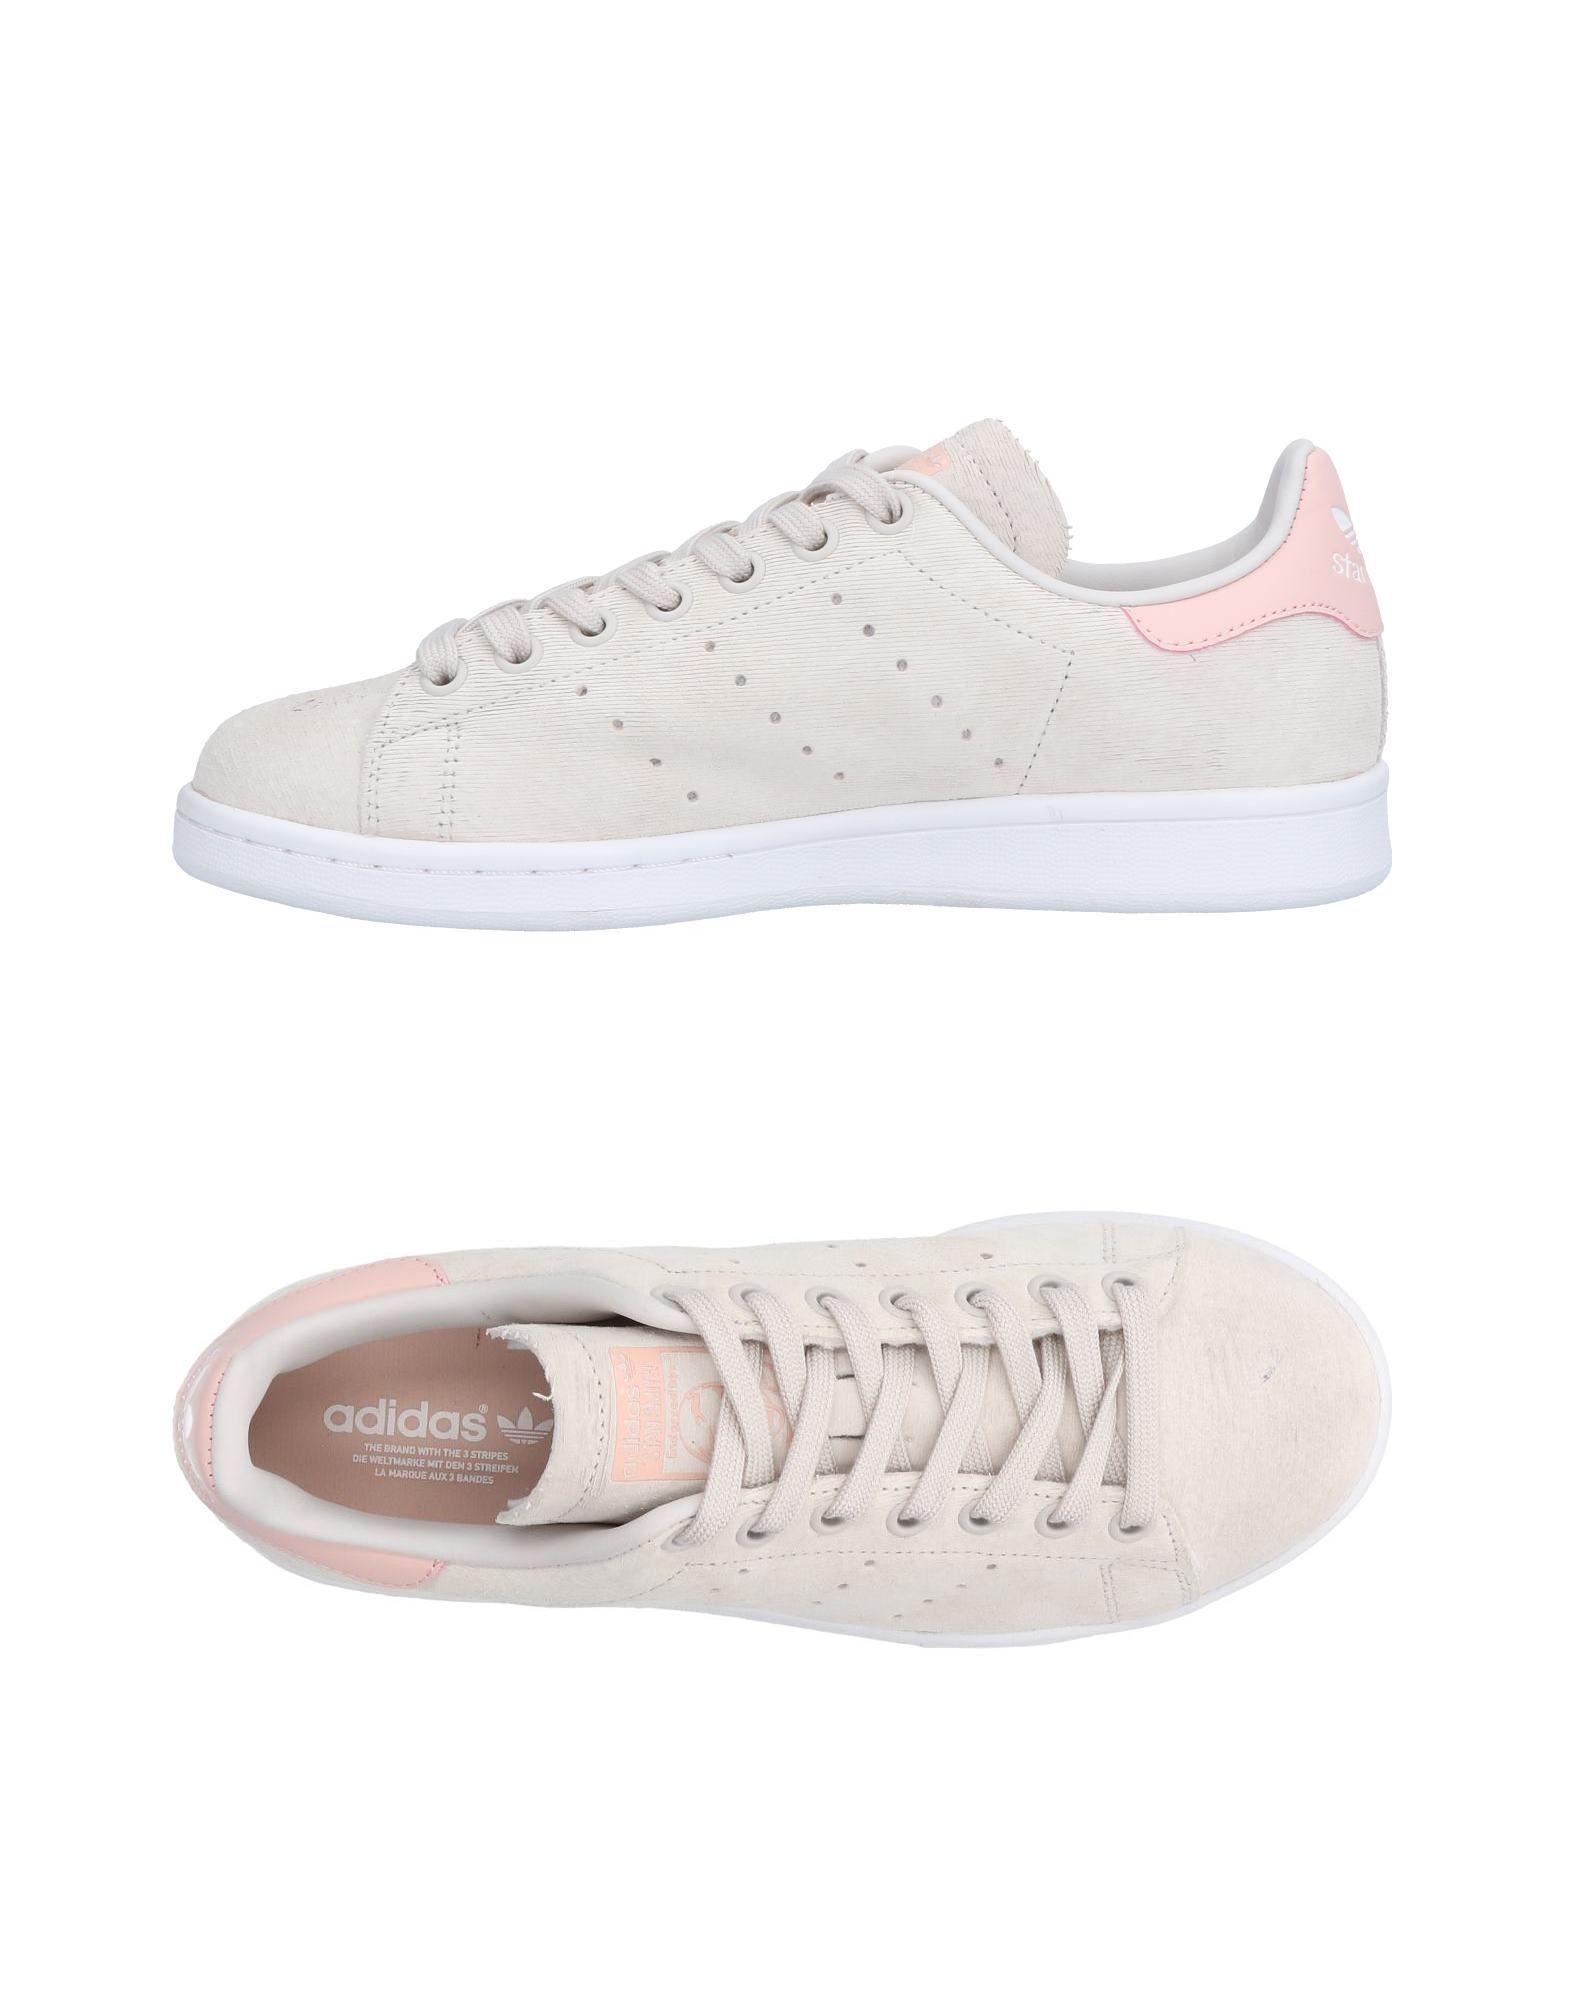 Adidas Originals Damen Sneakers Damen Originals  11472667JM Gute Qualität beliebte Schuhe 02982f